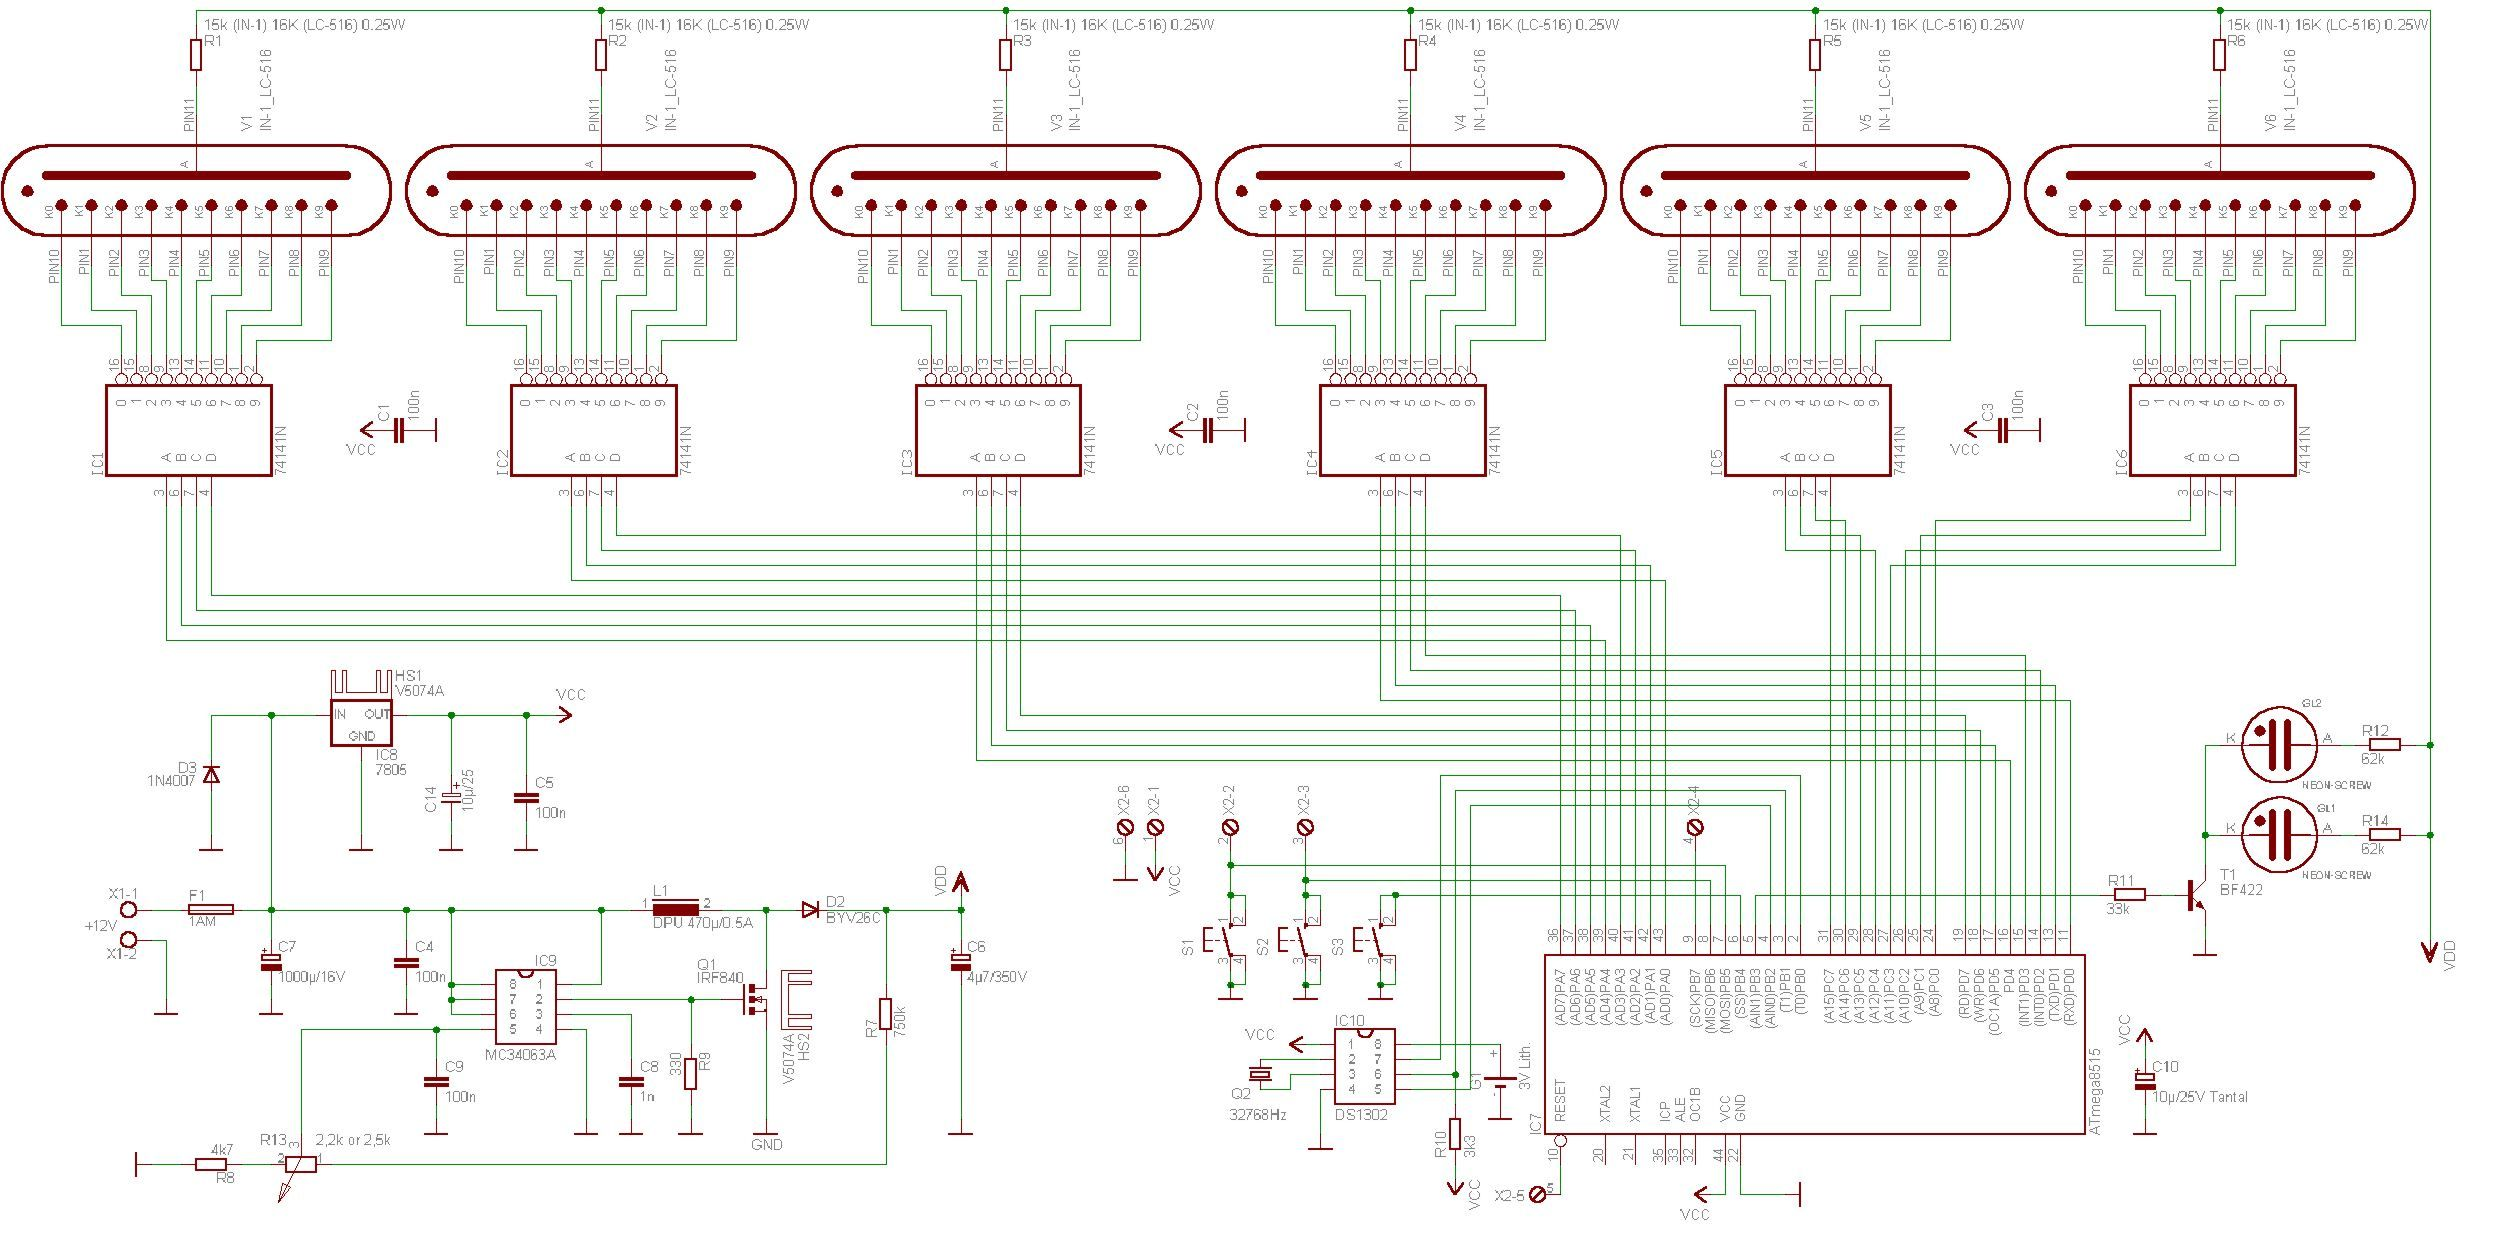 small resolution of nixietube clock schematic wiring diagram todaynixie tube clock schematics diagram data schema pic nixie clock schematic